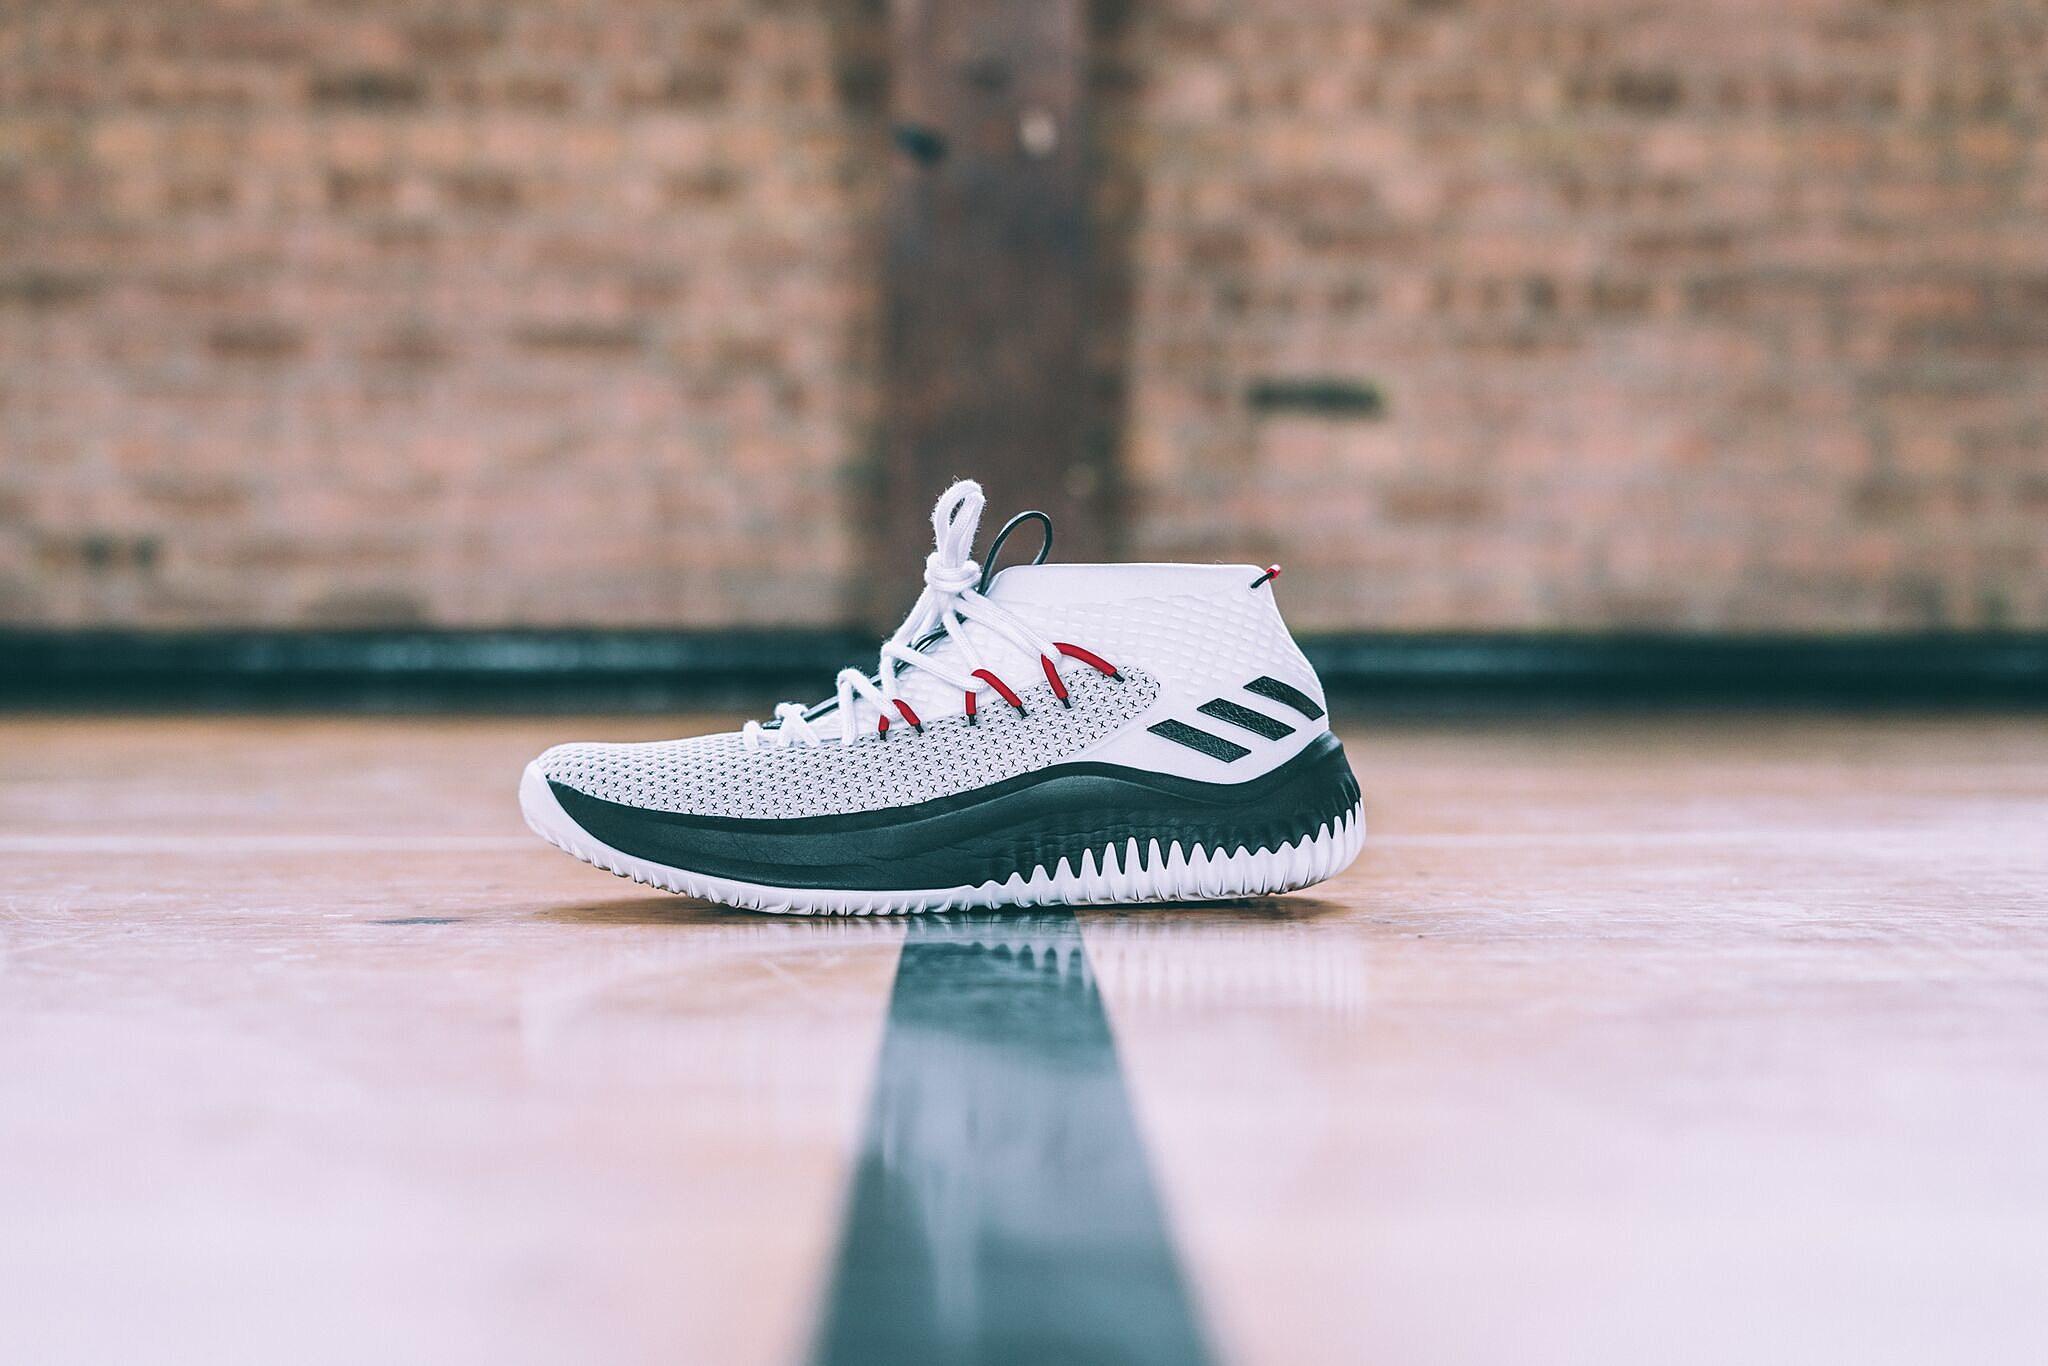 finest selection dd7cb 8db34 Adidas Unveils the Fourth Signature Shoe for NBA Star Damian Lillard - XXL